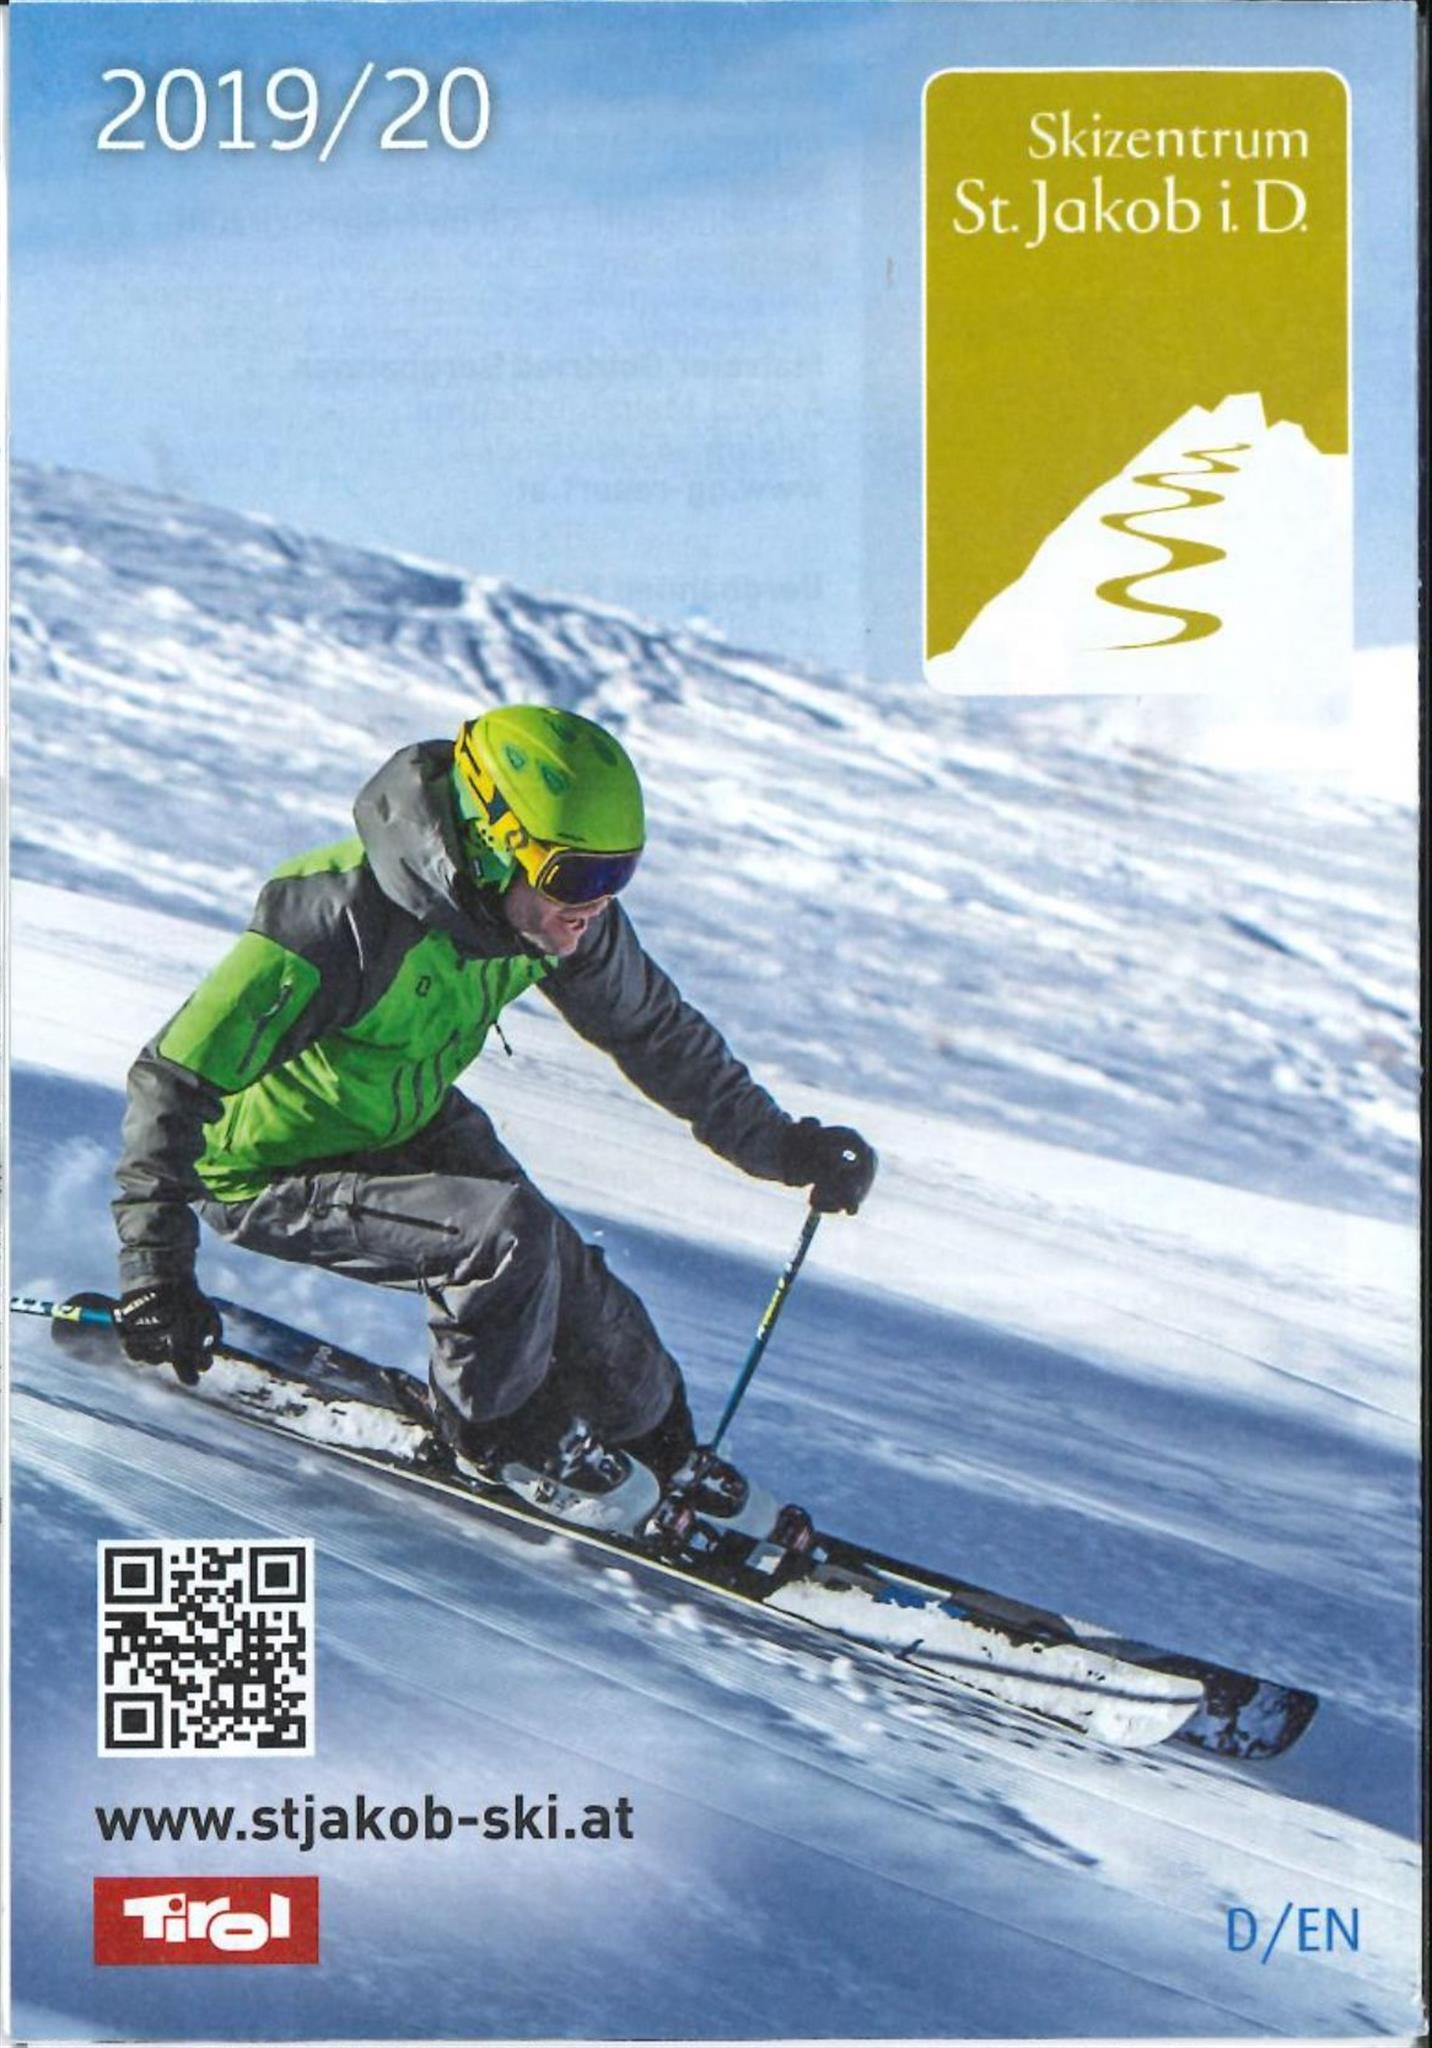 Skizentrum-St-Jakob.jpg